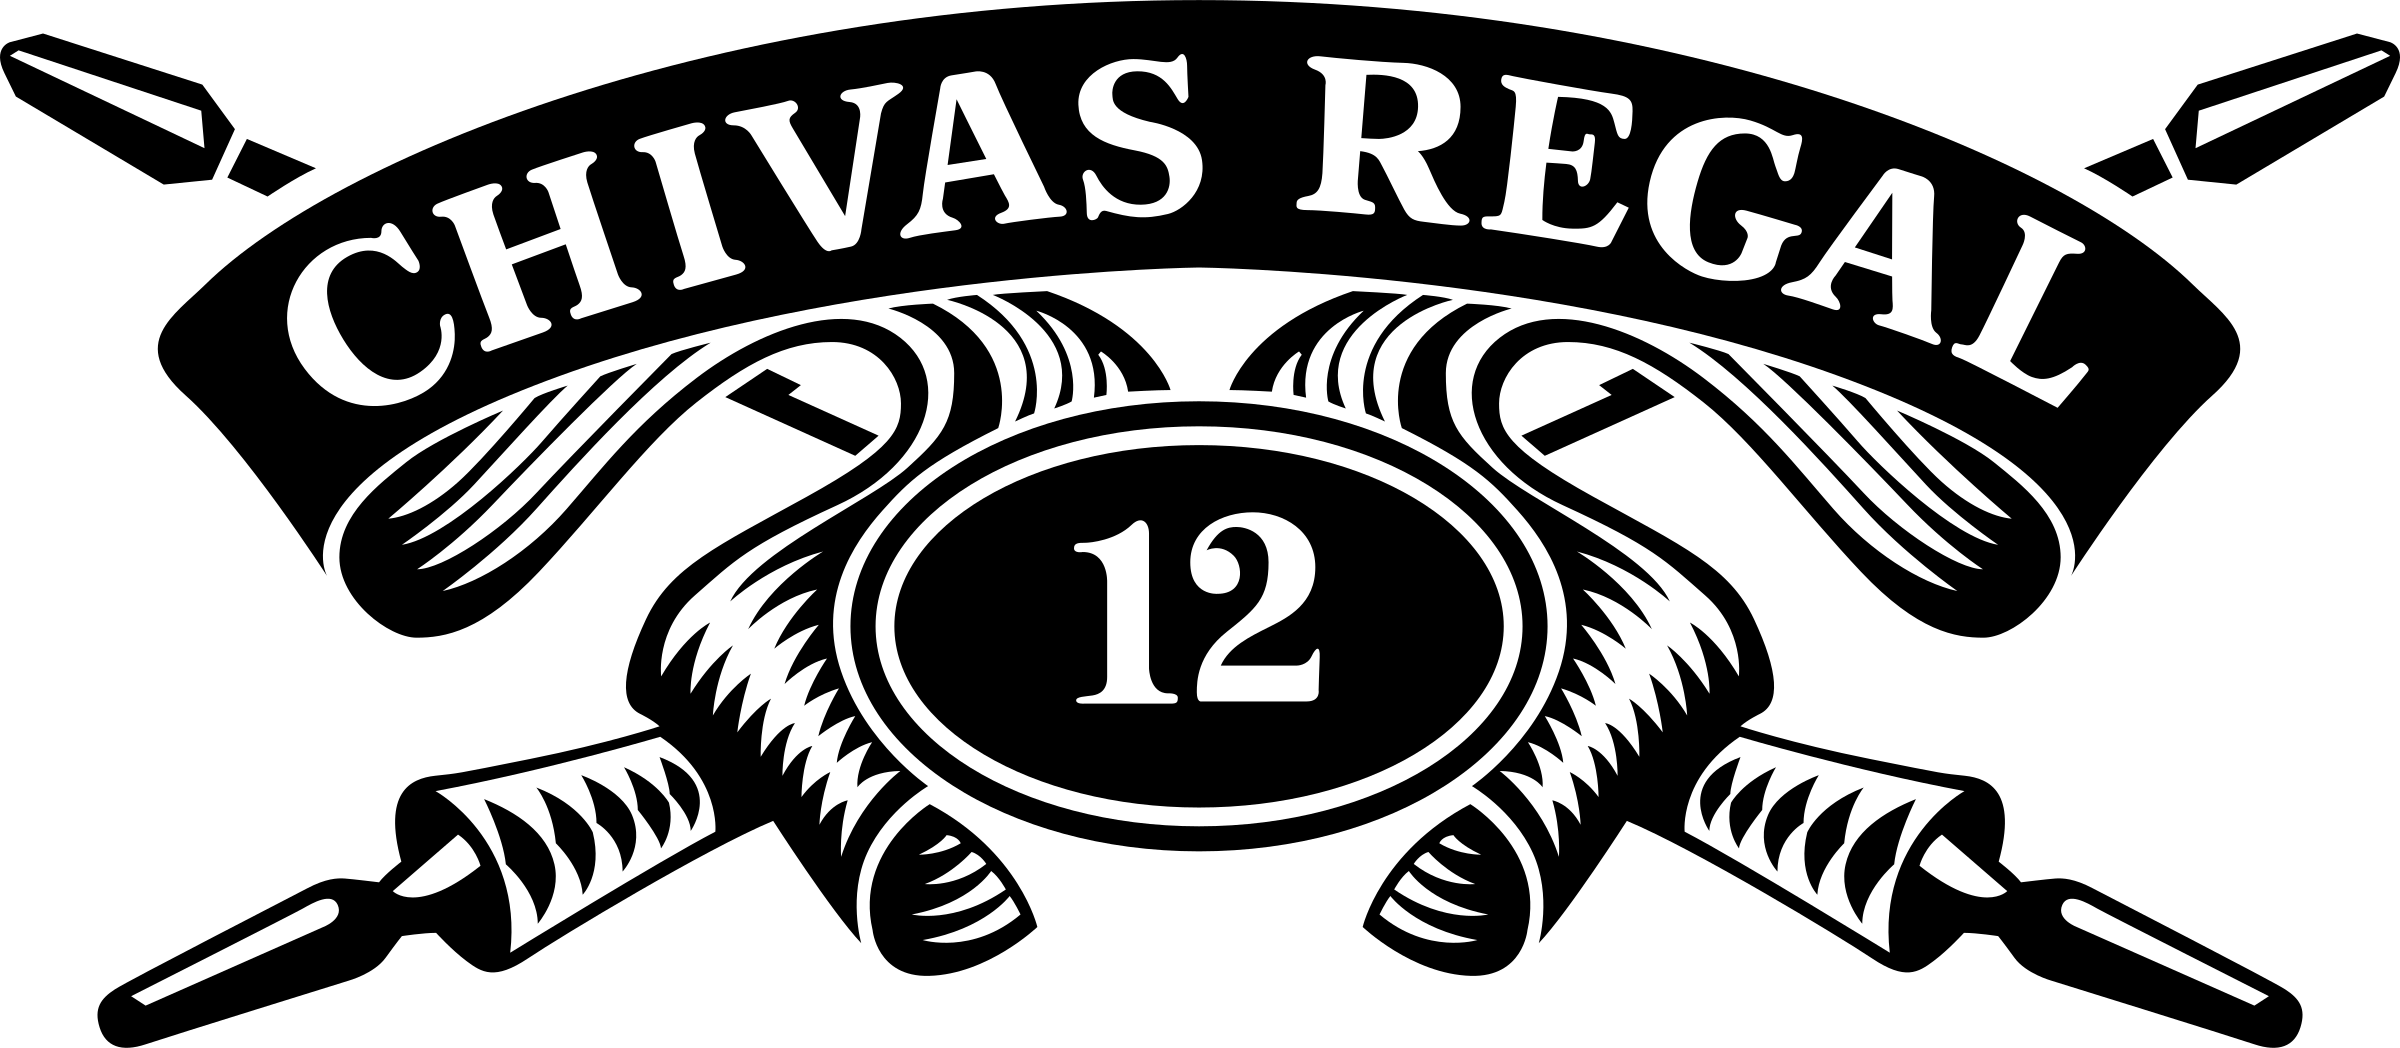 Chivas Regal Logo Png Transparent Svg Vector Freebie Supply